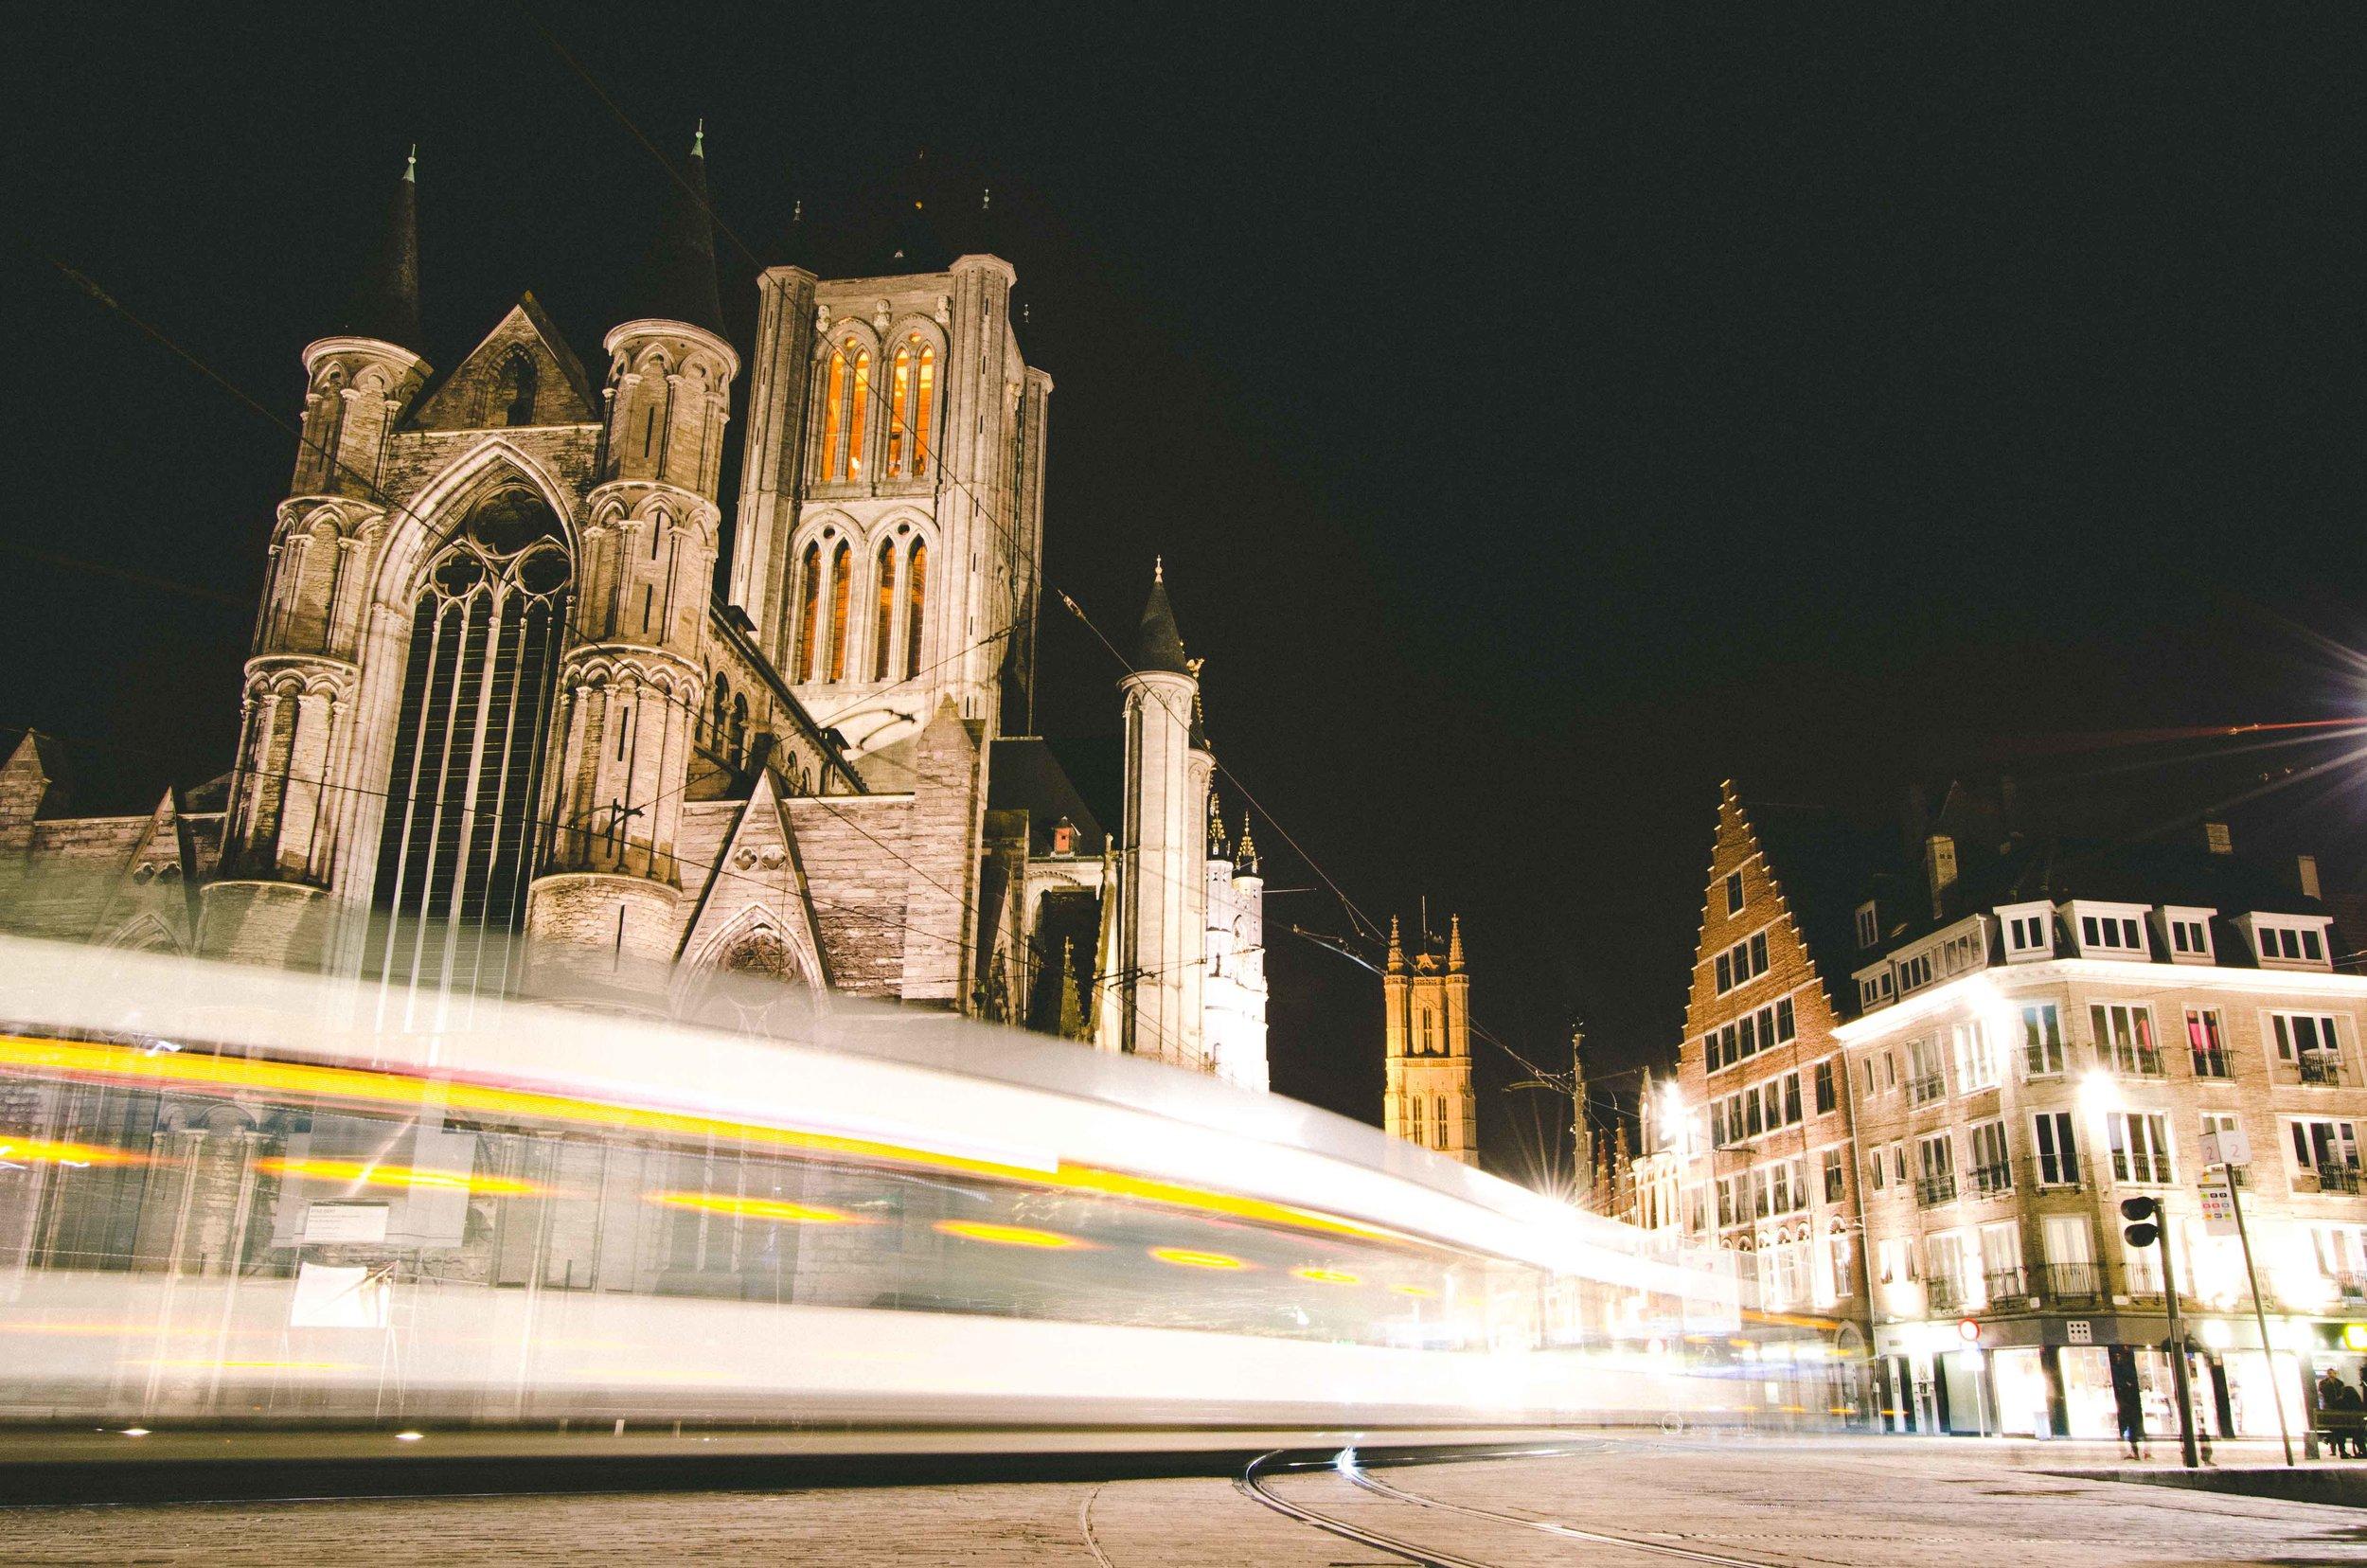 Saint Nicholas' Church at night